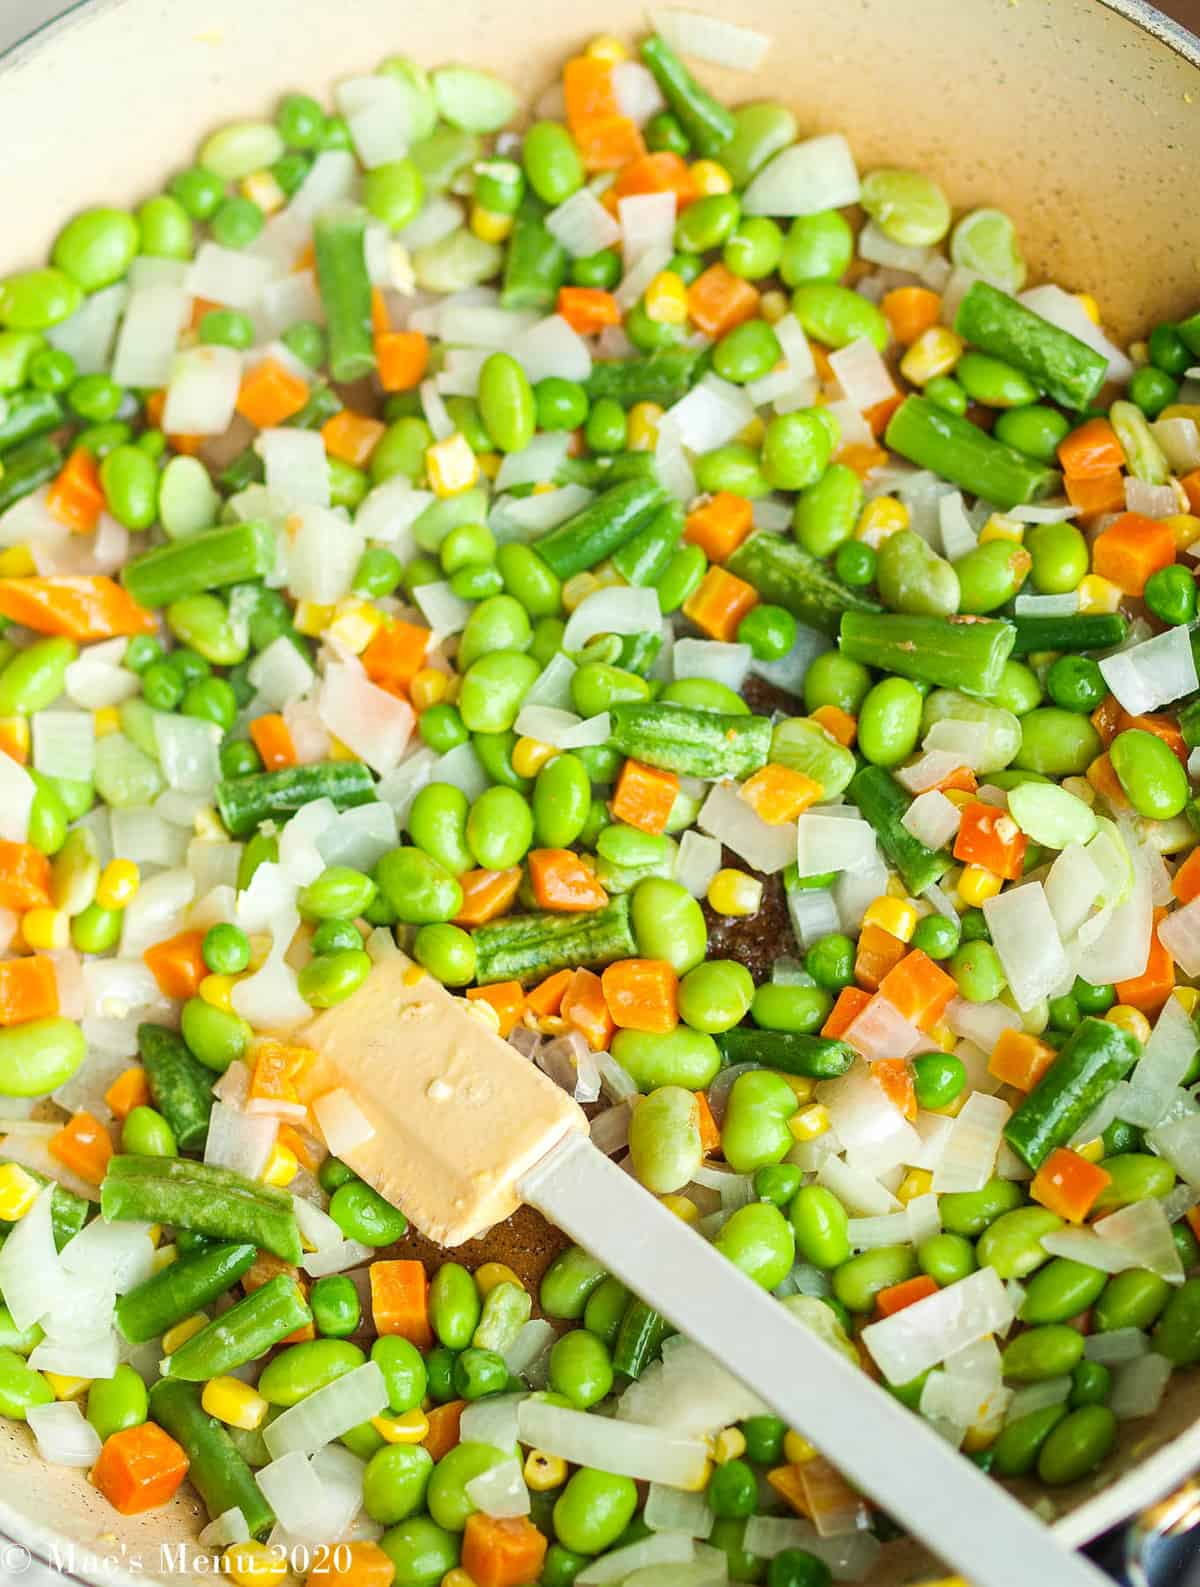 Veggies stir fried in a non-stick pan